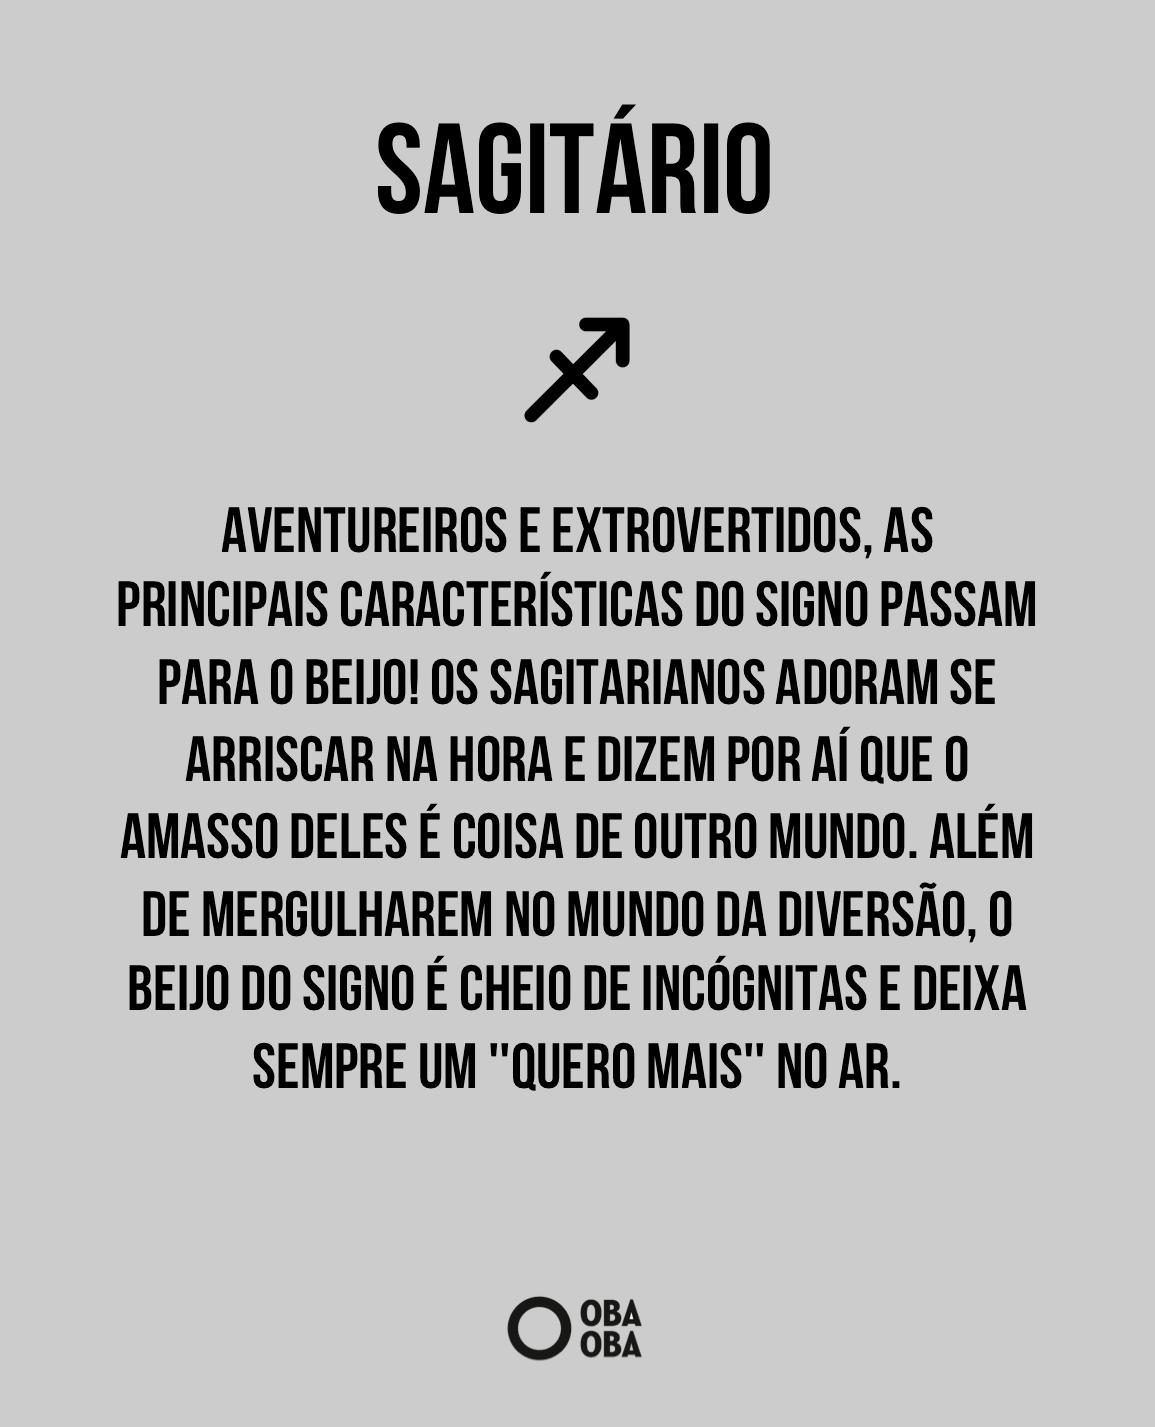 Por fin podrás saber todo sobre este signo del zodiaco